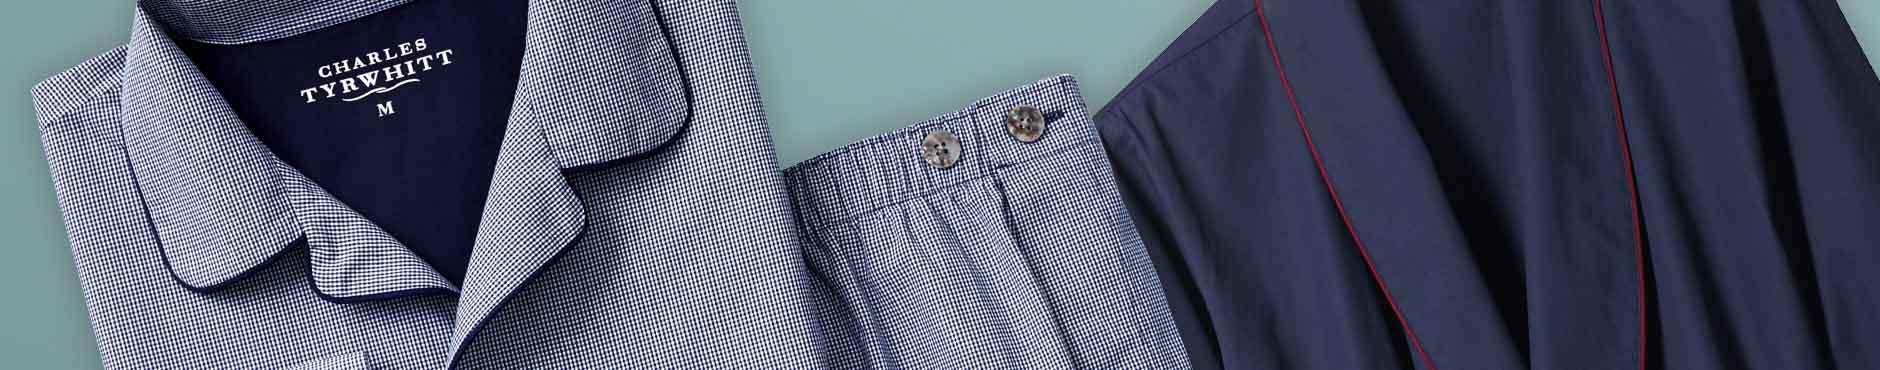 Charles Tyrwhitt T-shirts et pyjamas